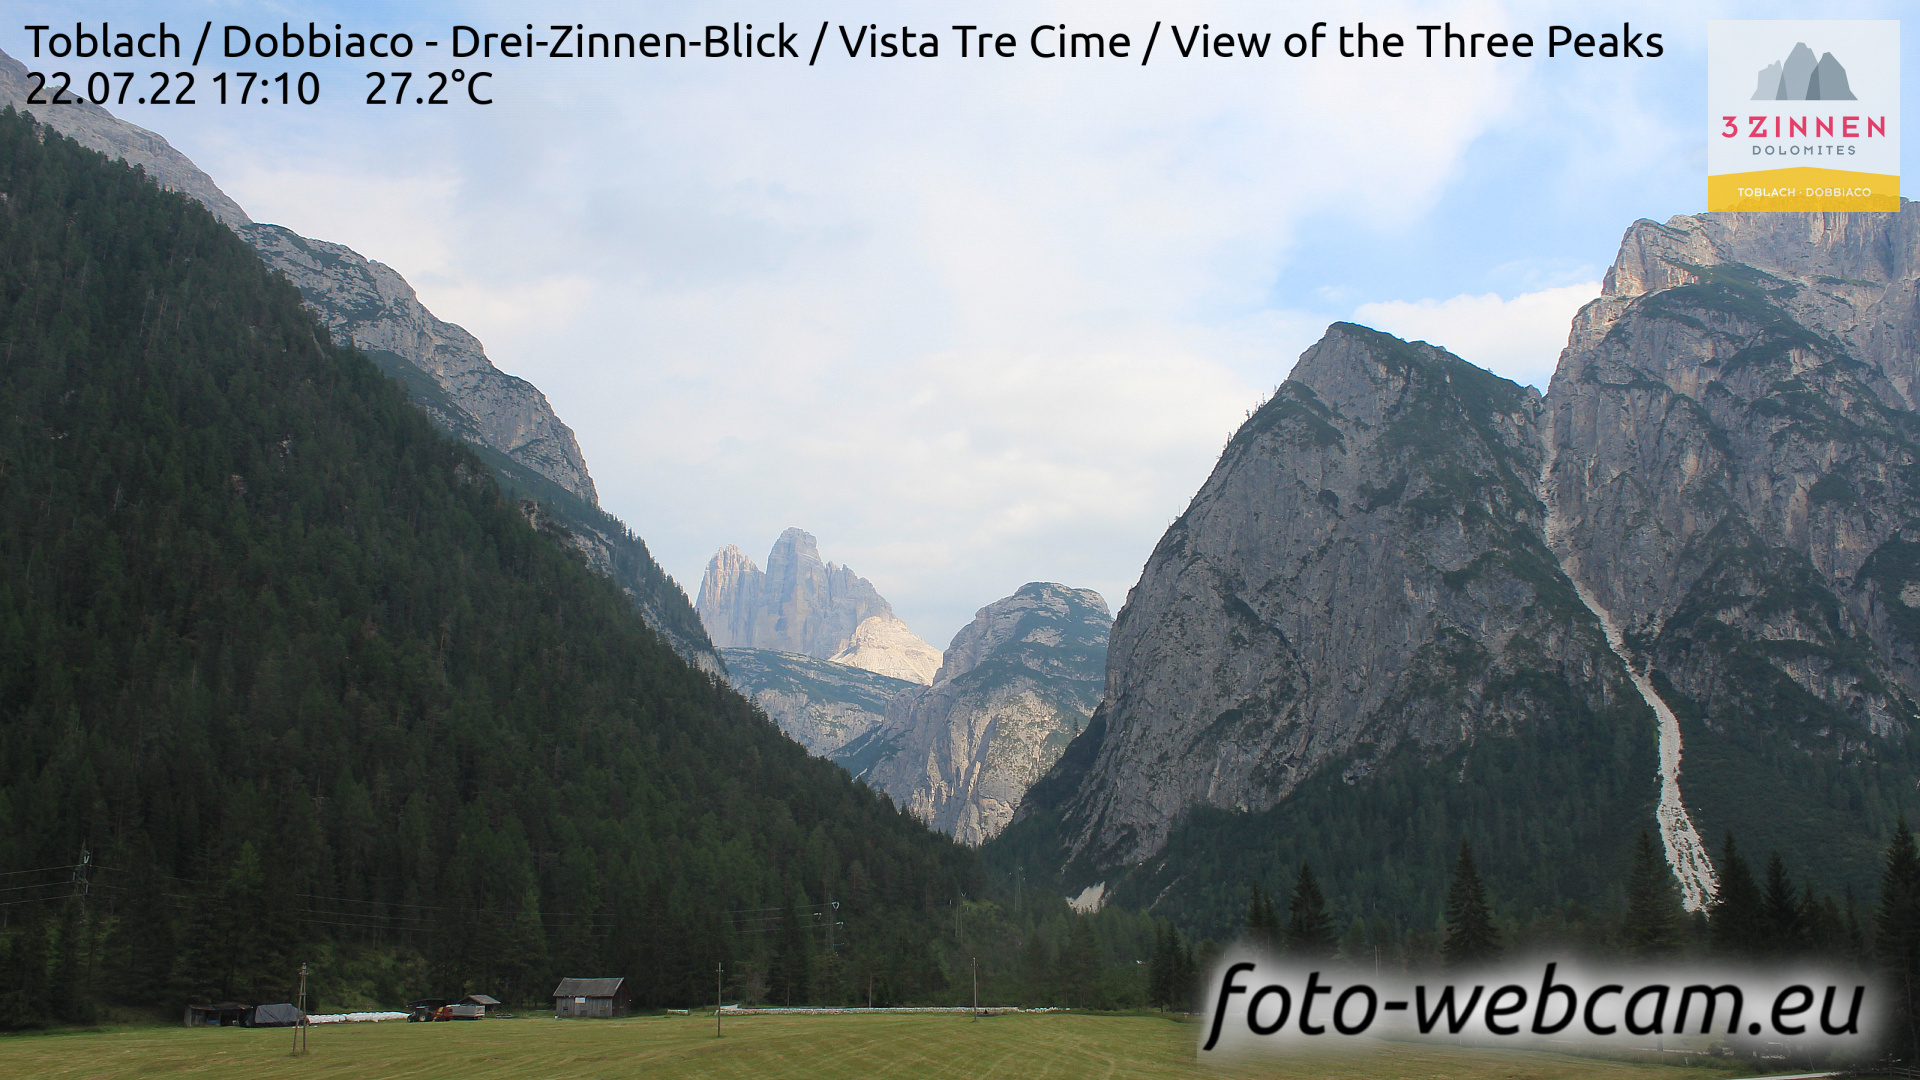 Toblach (Dolomiten) Do. 17:27